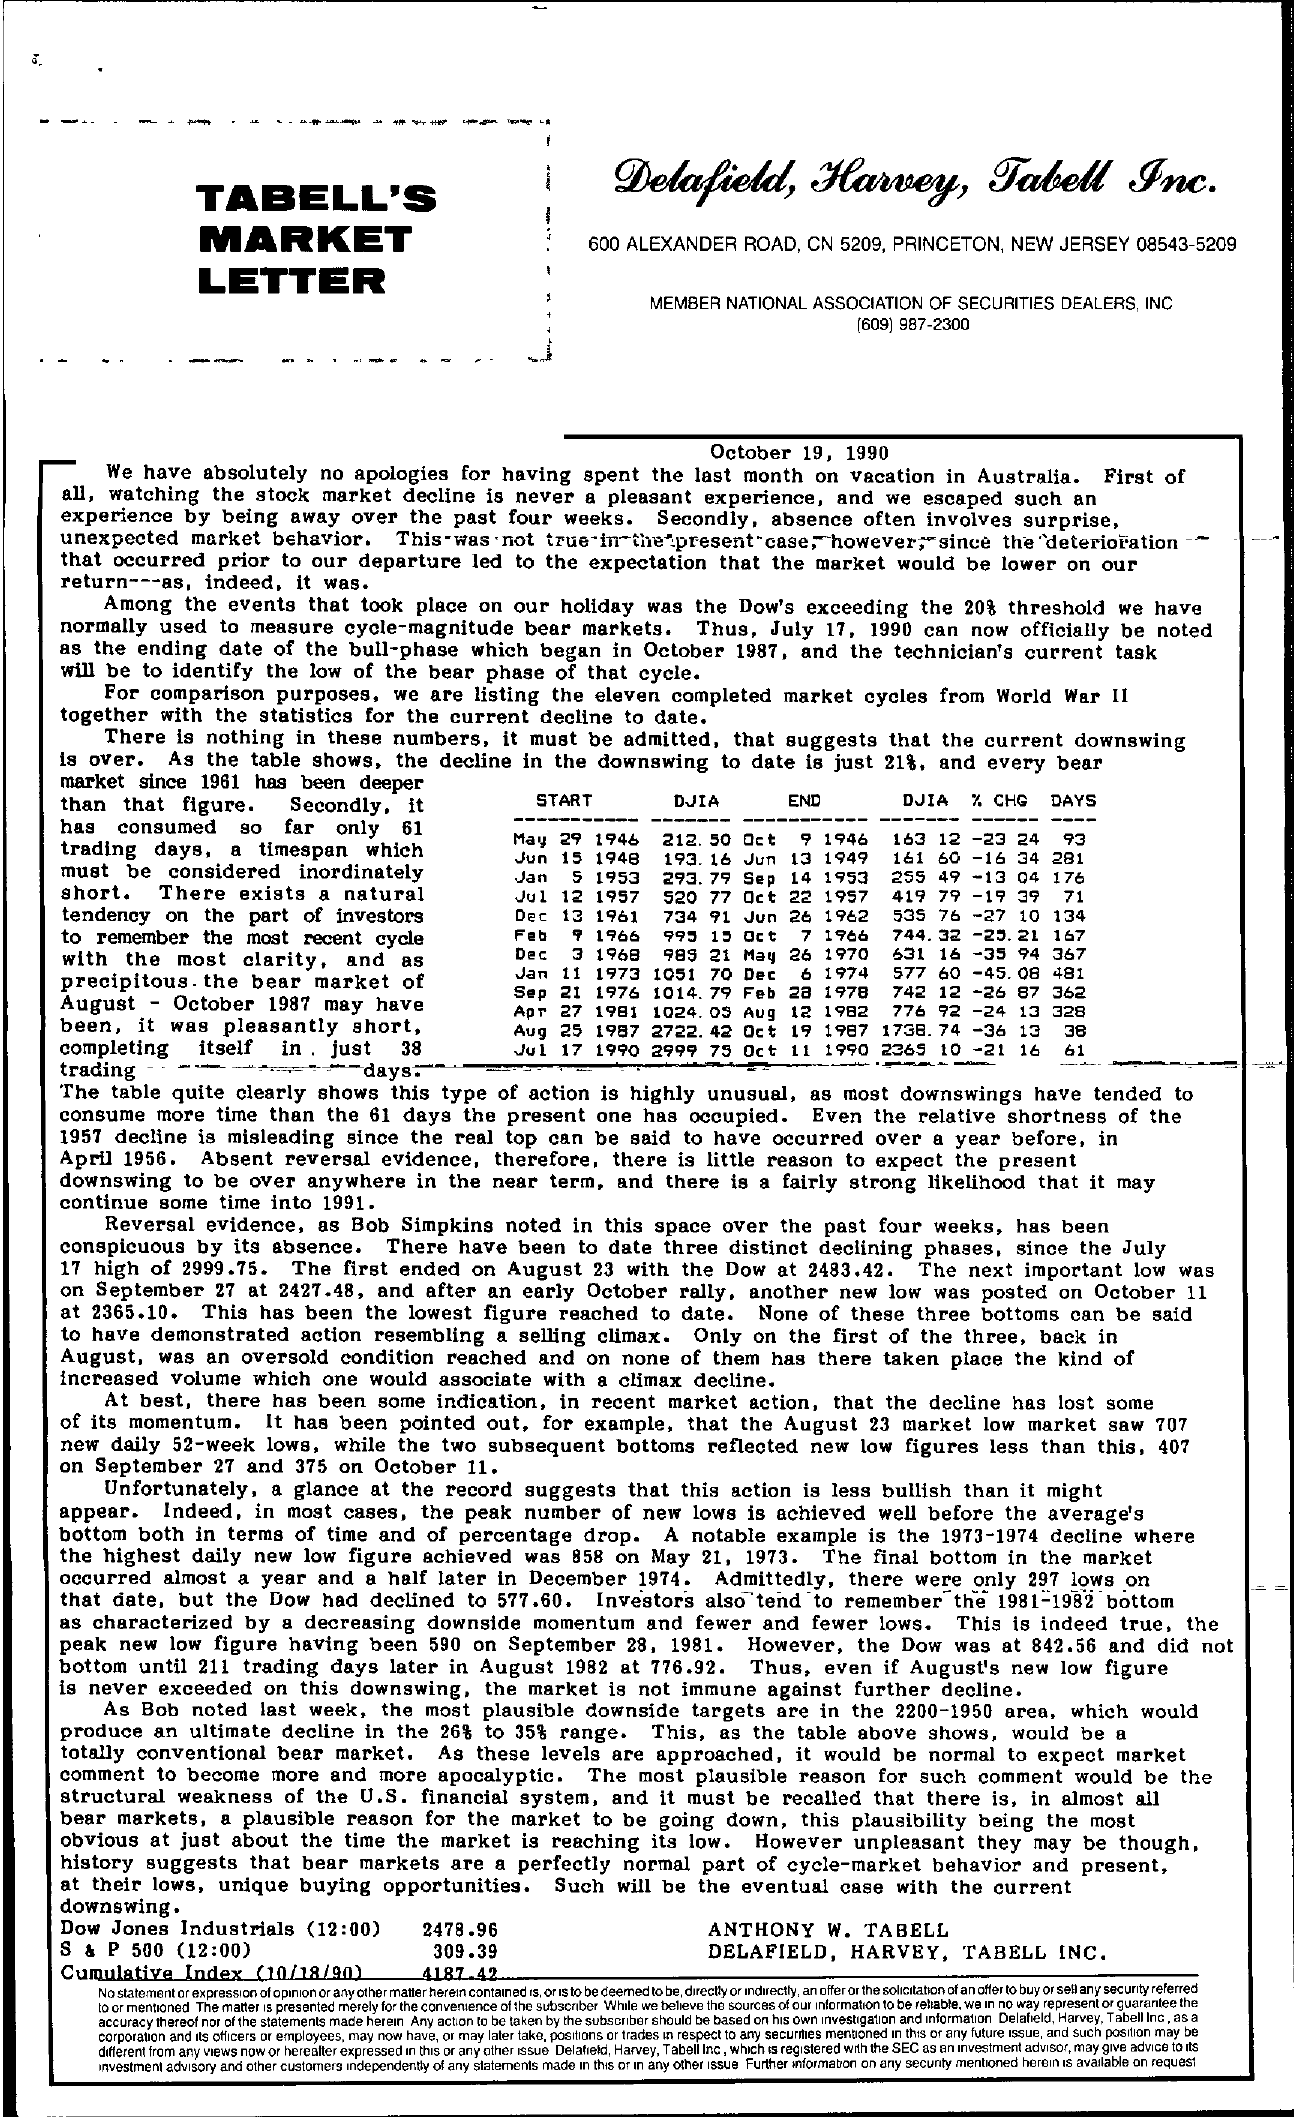 Tabell's Market Letter - October 19, 1990